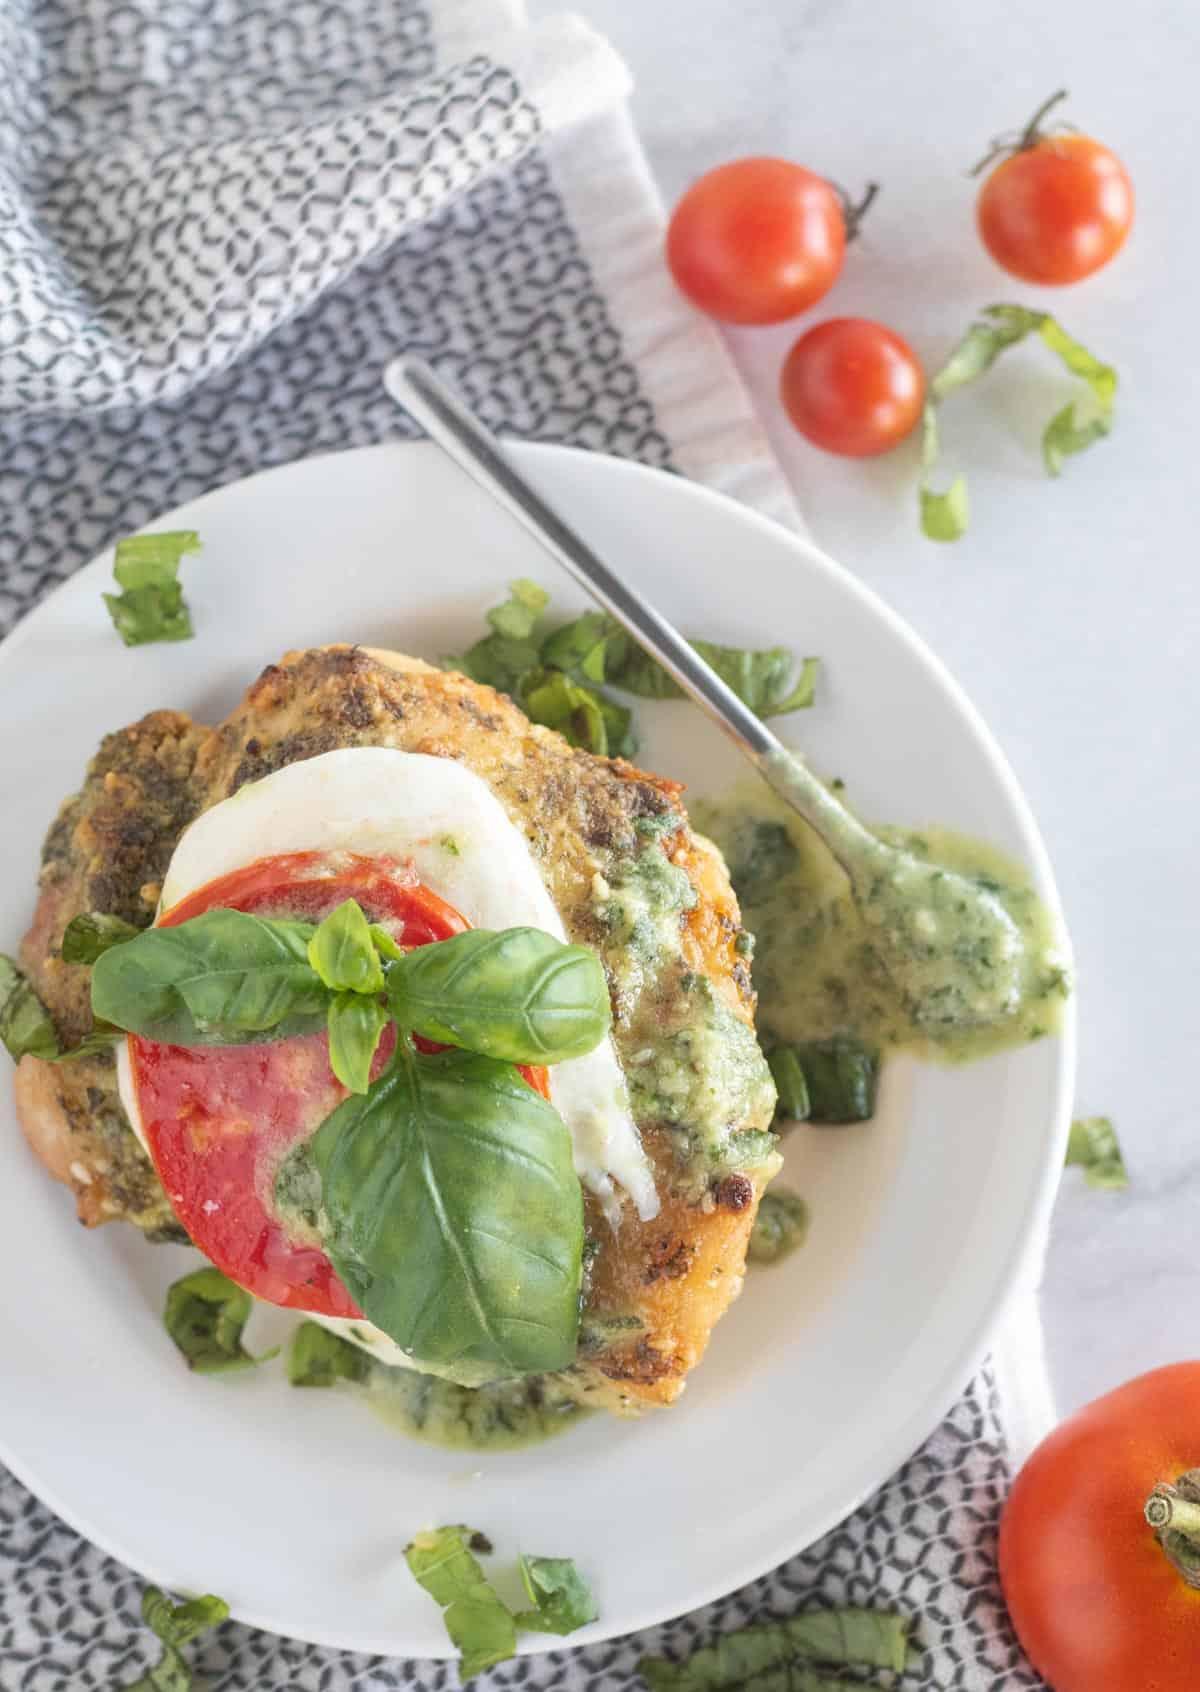 overhead shoto of pesto chicken on plate with mozzarella, tomato, and basil